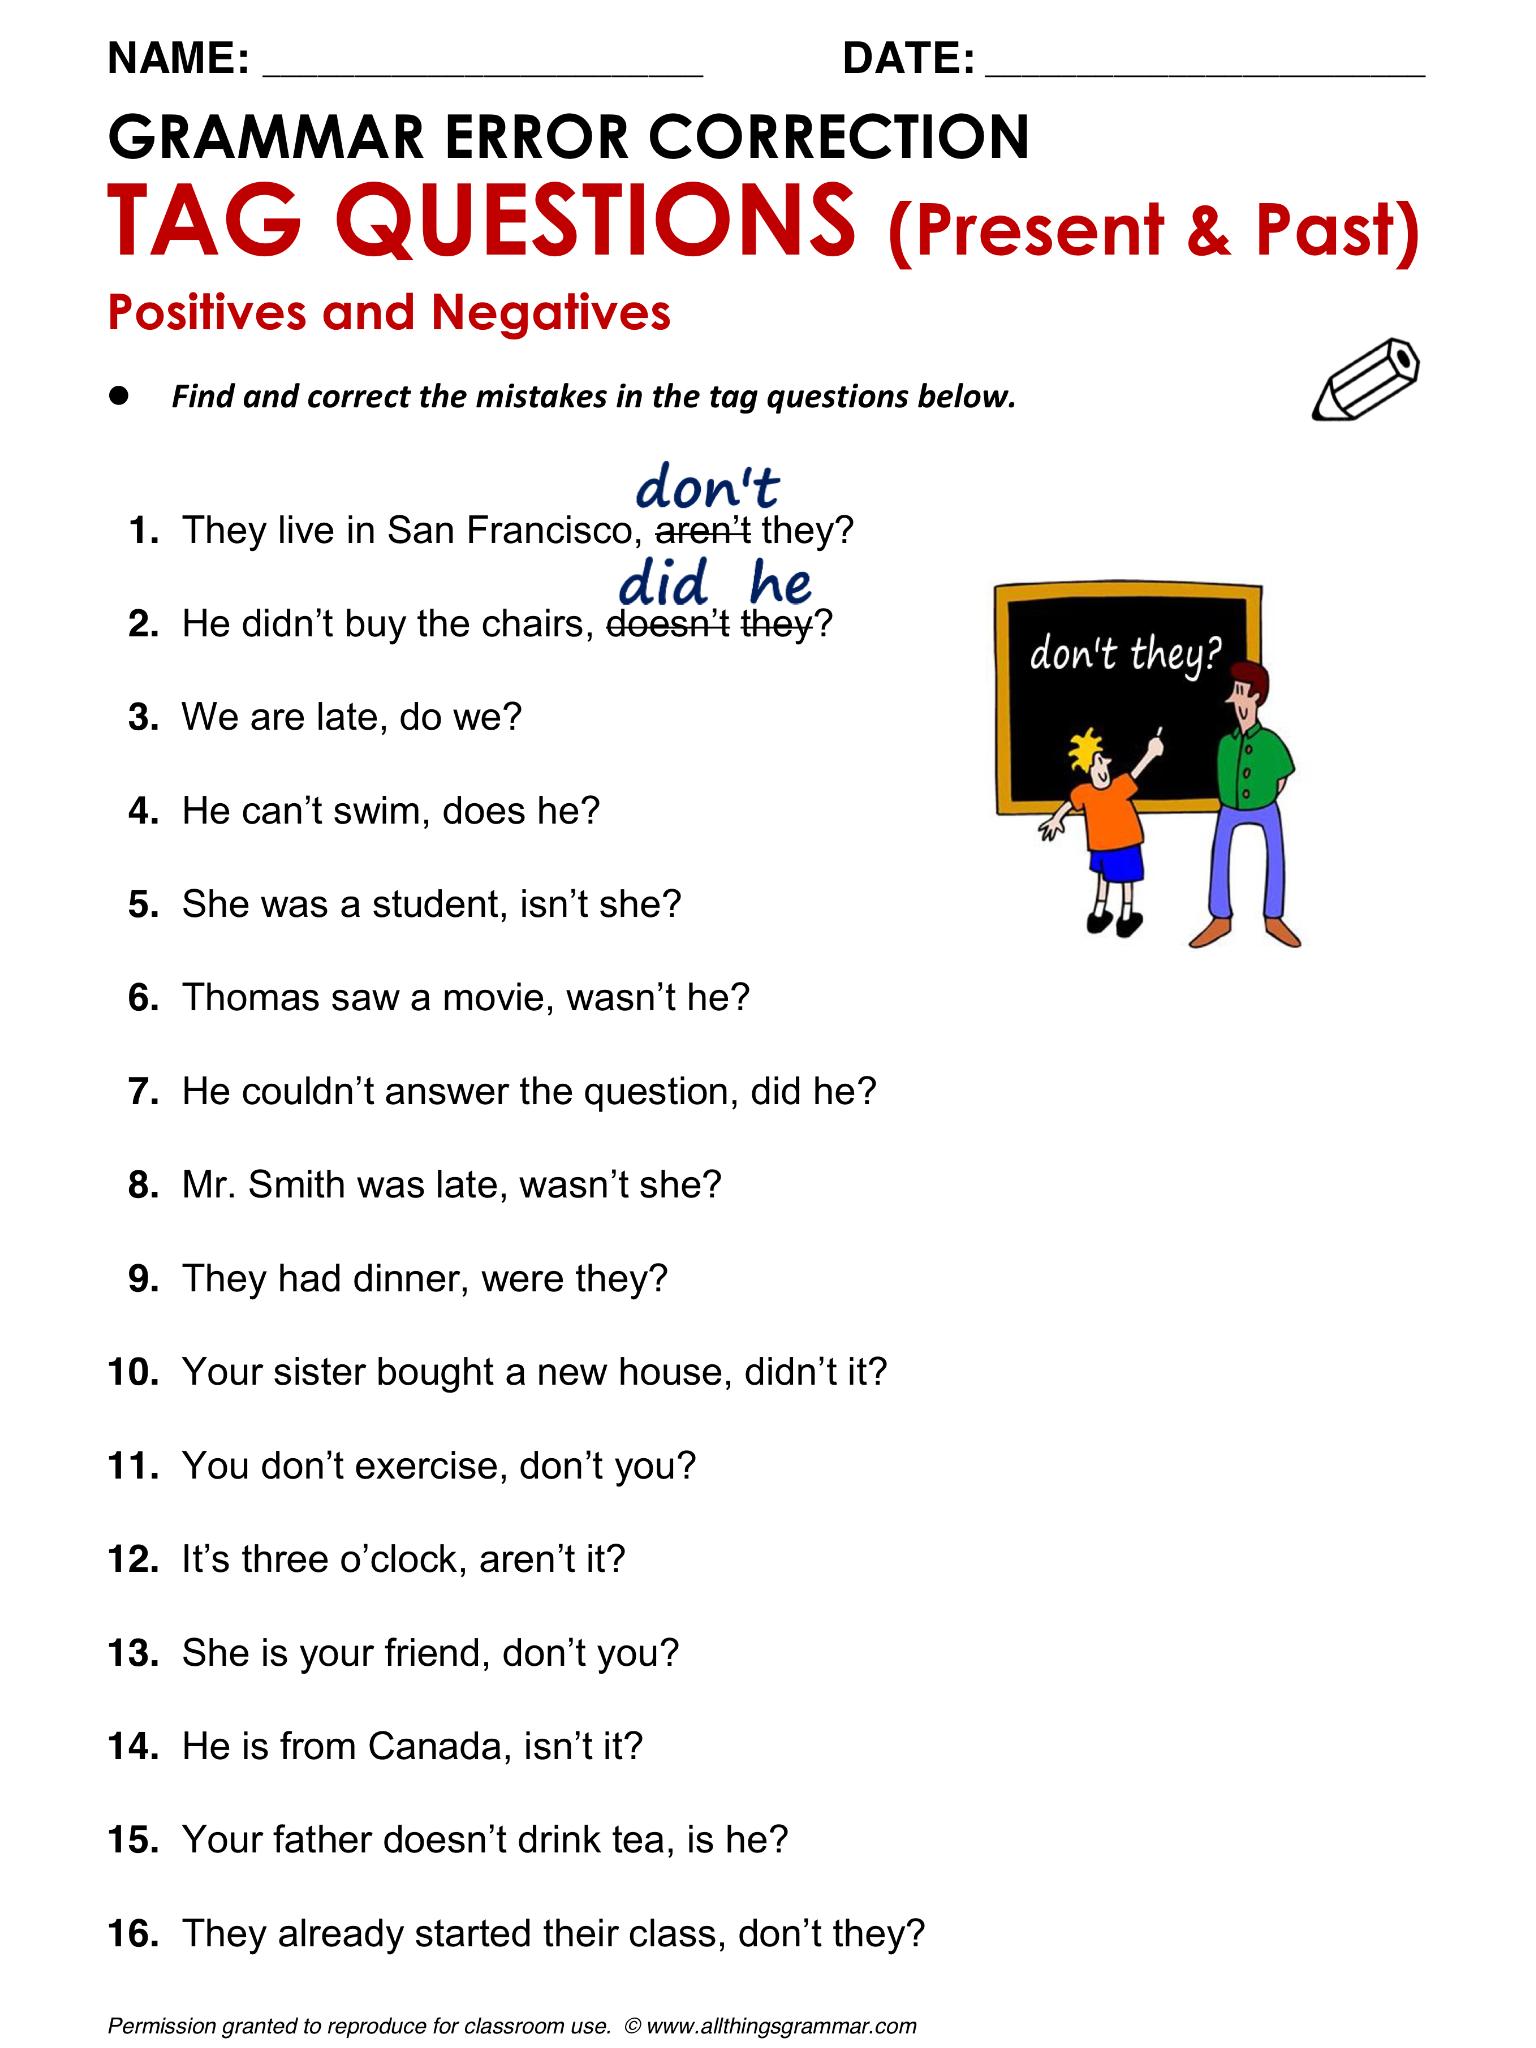 English Grammar Tag Questions www.allthingsgrammar.com/tag ...